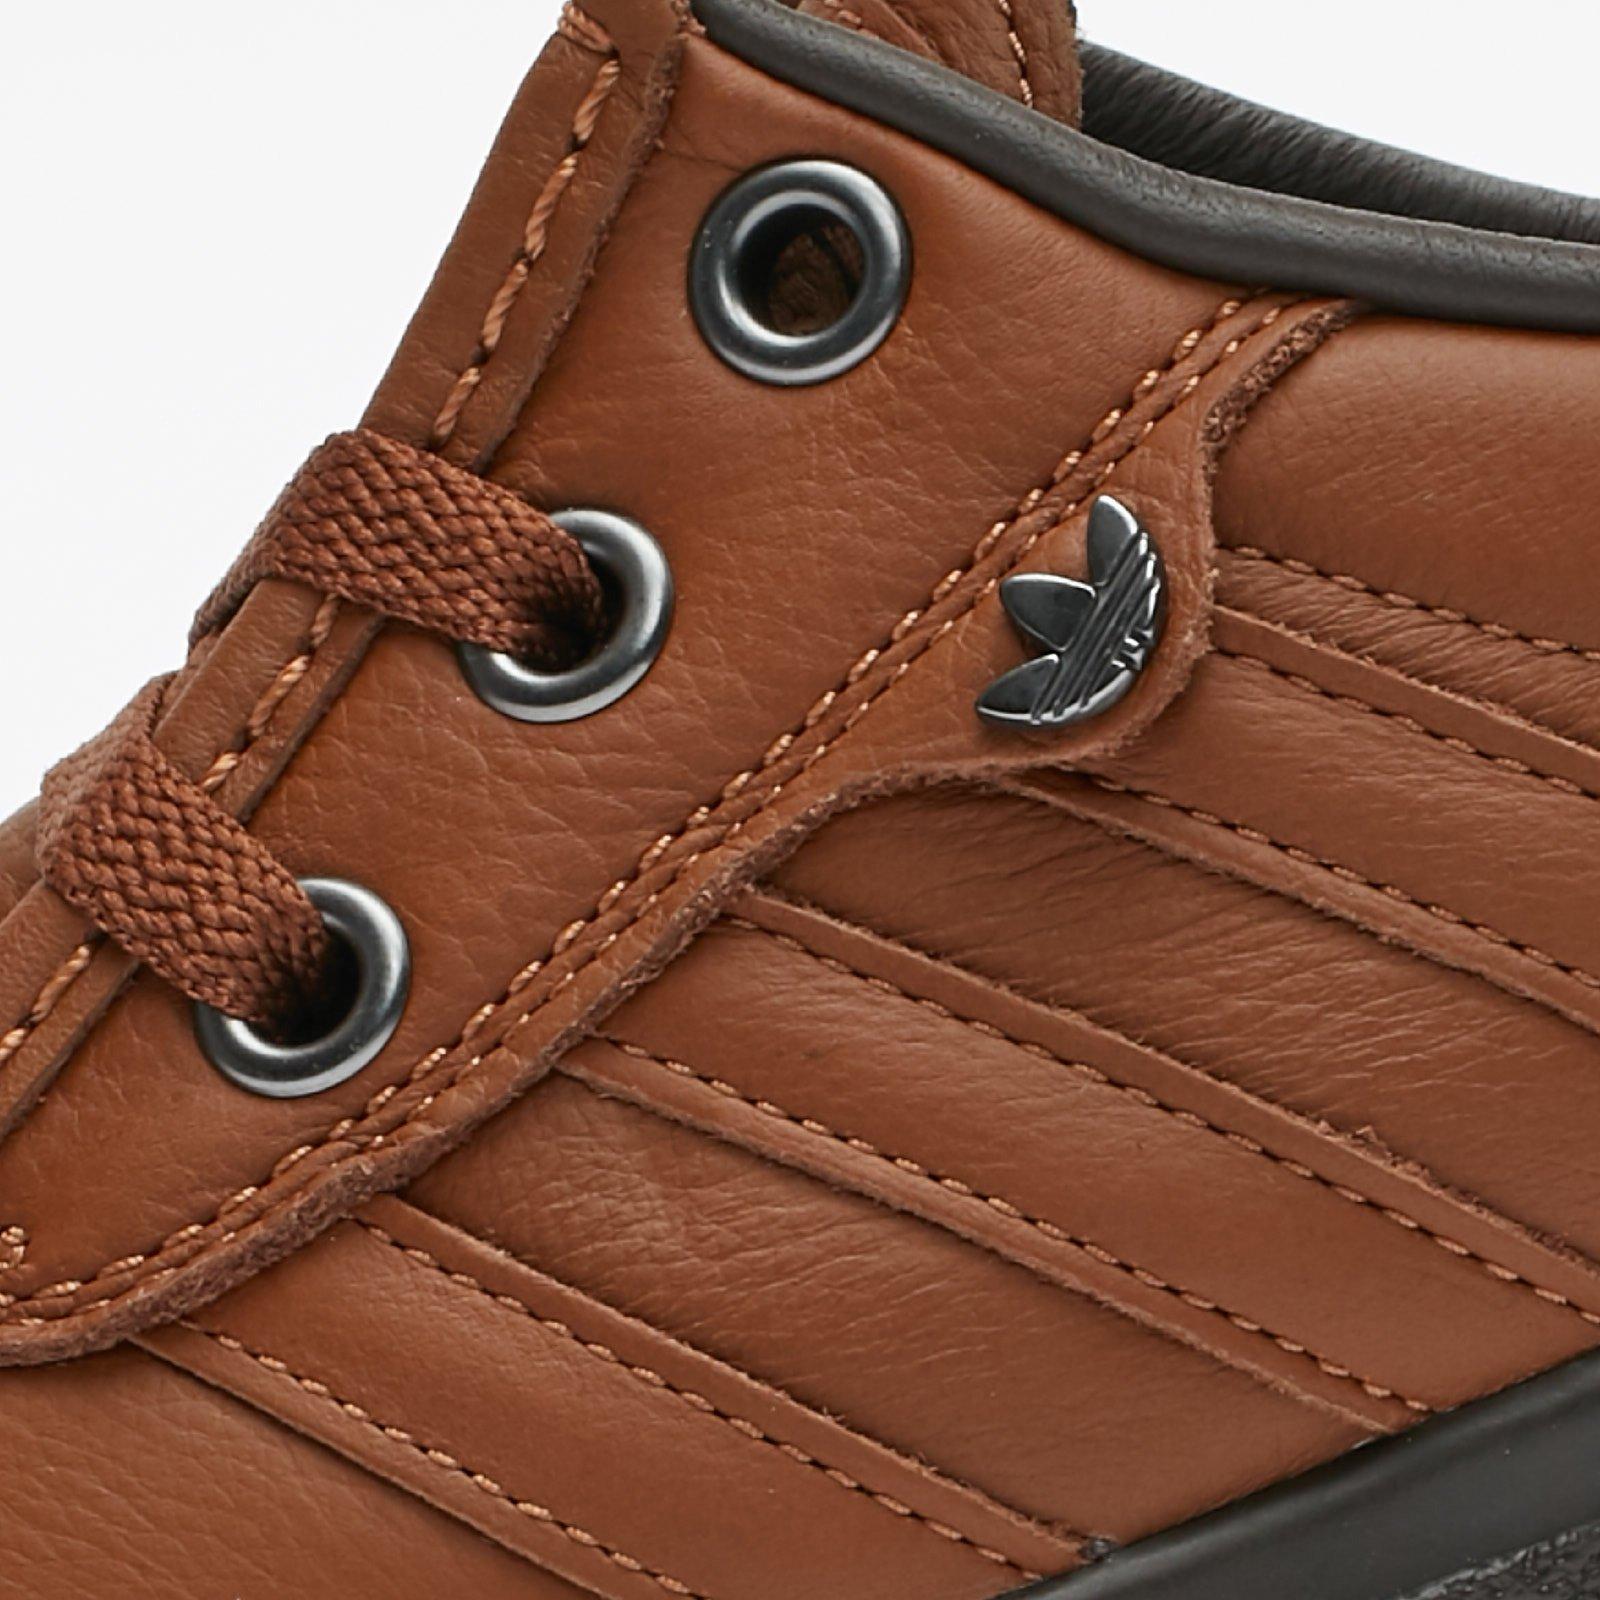 aeb79288ebcf adidas Punstock Spzl - B41826 - Sneakersnstuff   Sneaker ...